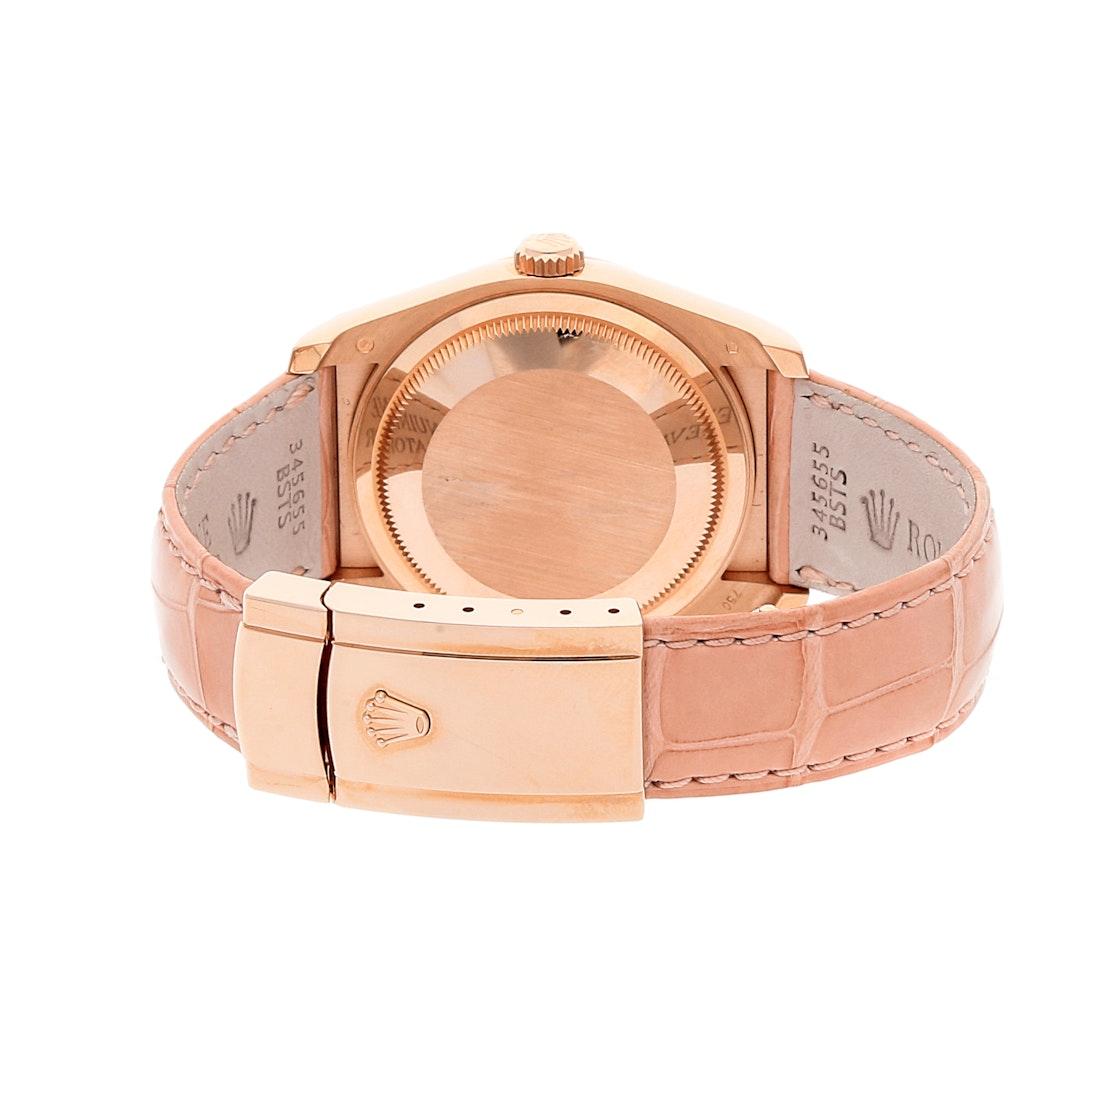 Rolex Datejust 116135